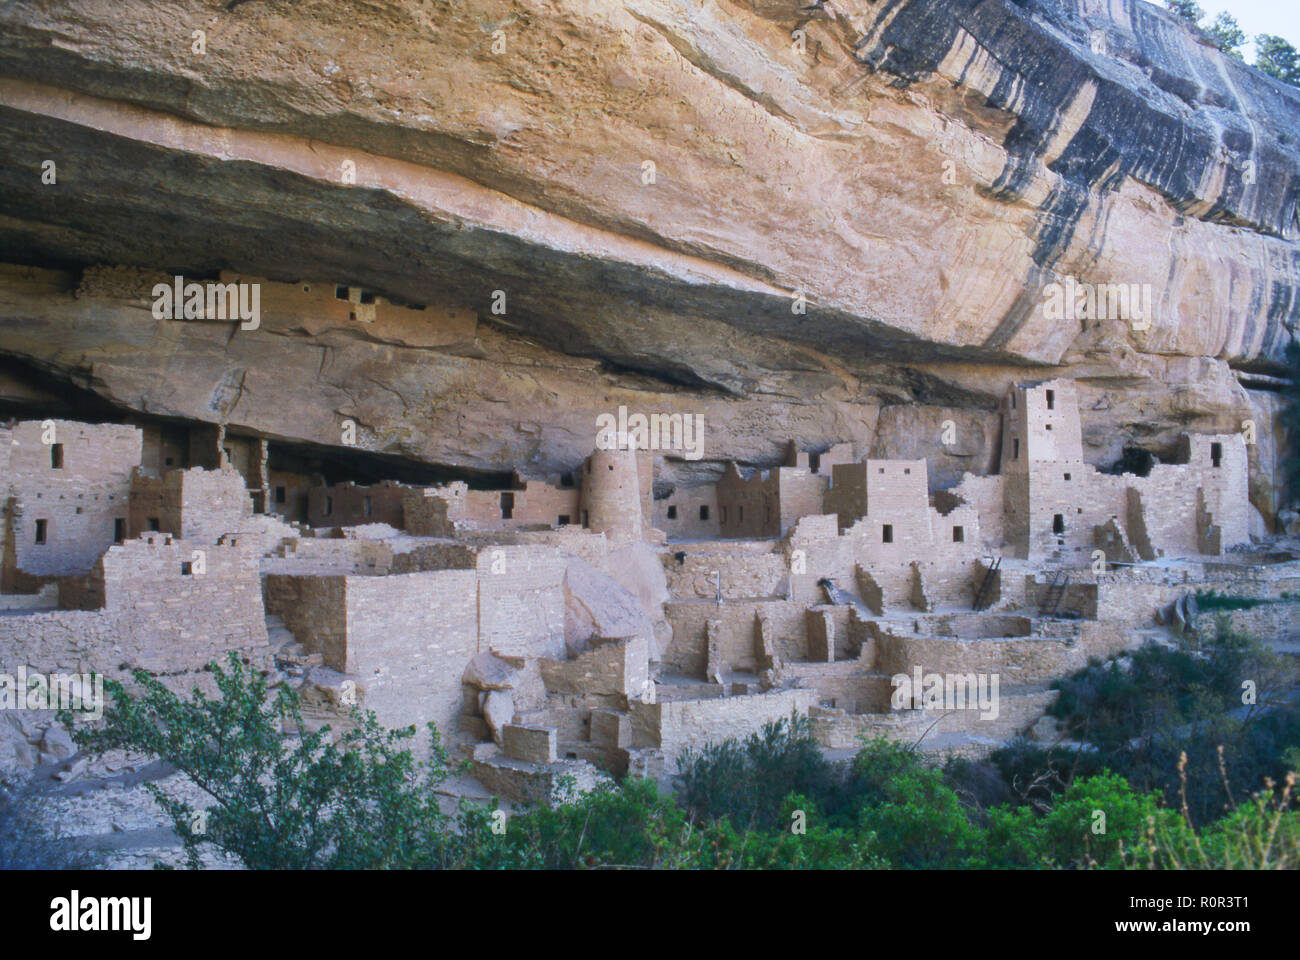 Cliff Palace, multistory Anasazi/Puebloan city at Mesa Verde National Park, Colorado. Photograph - Stock Image